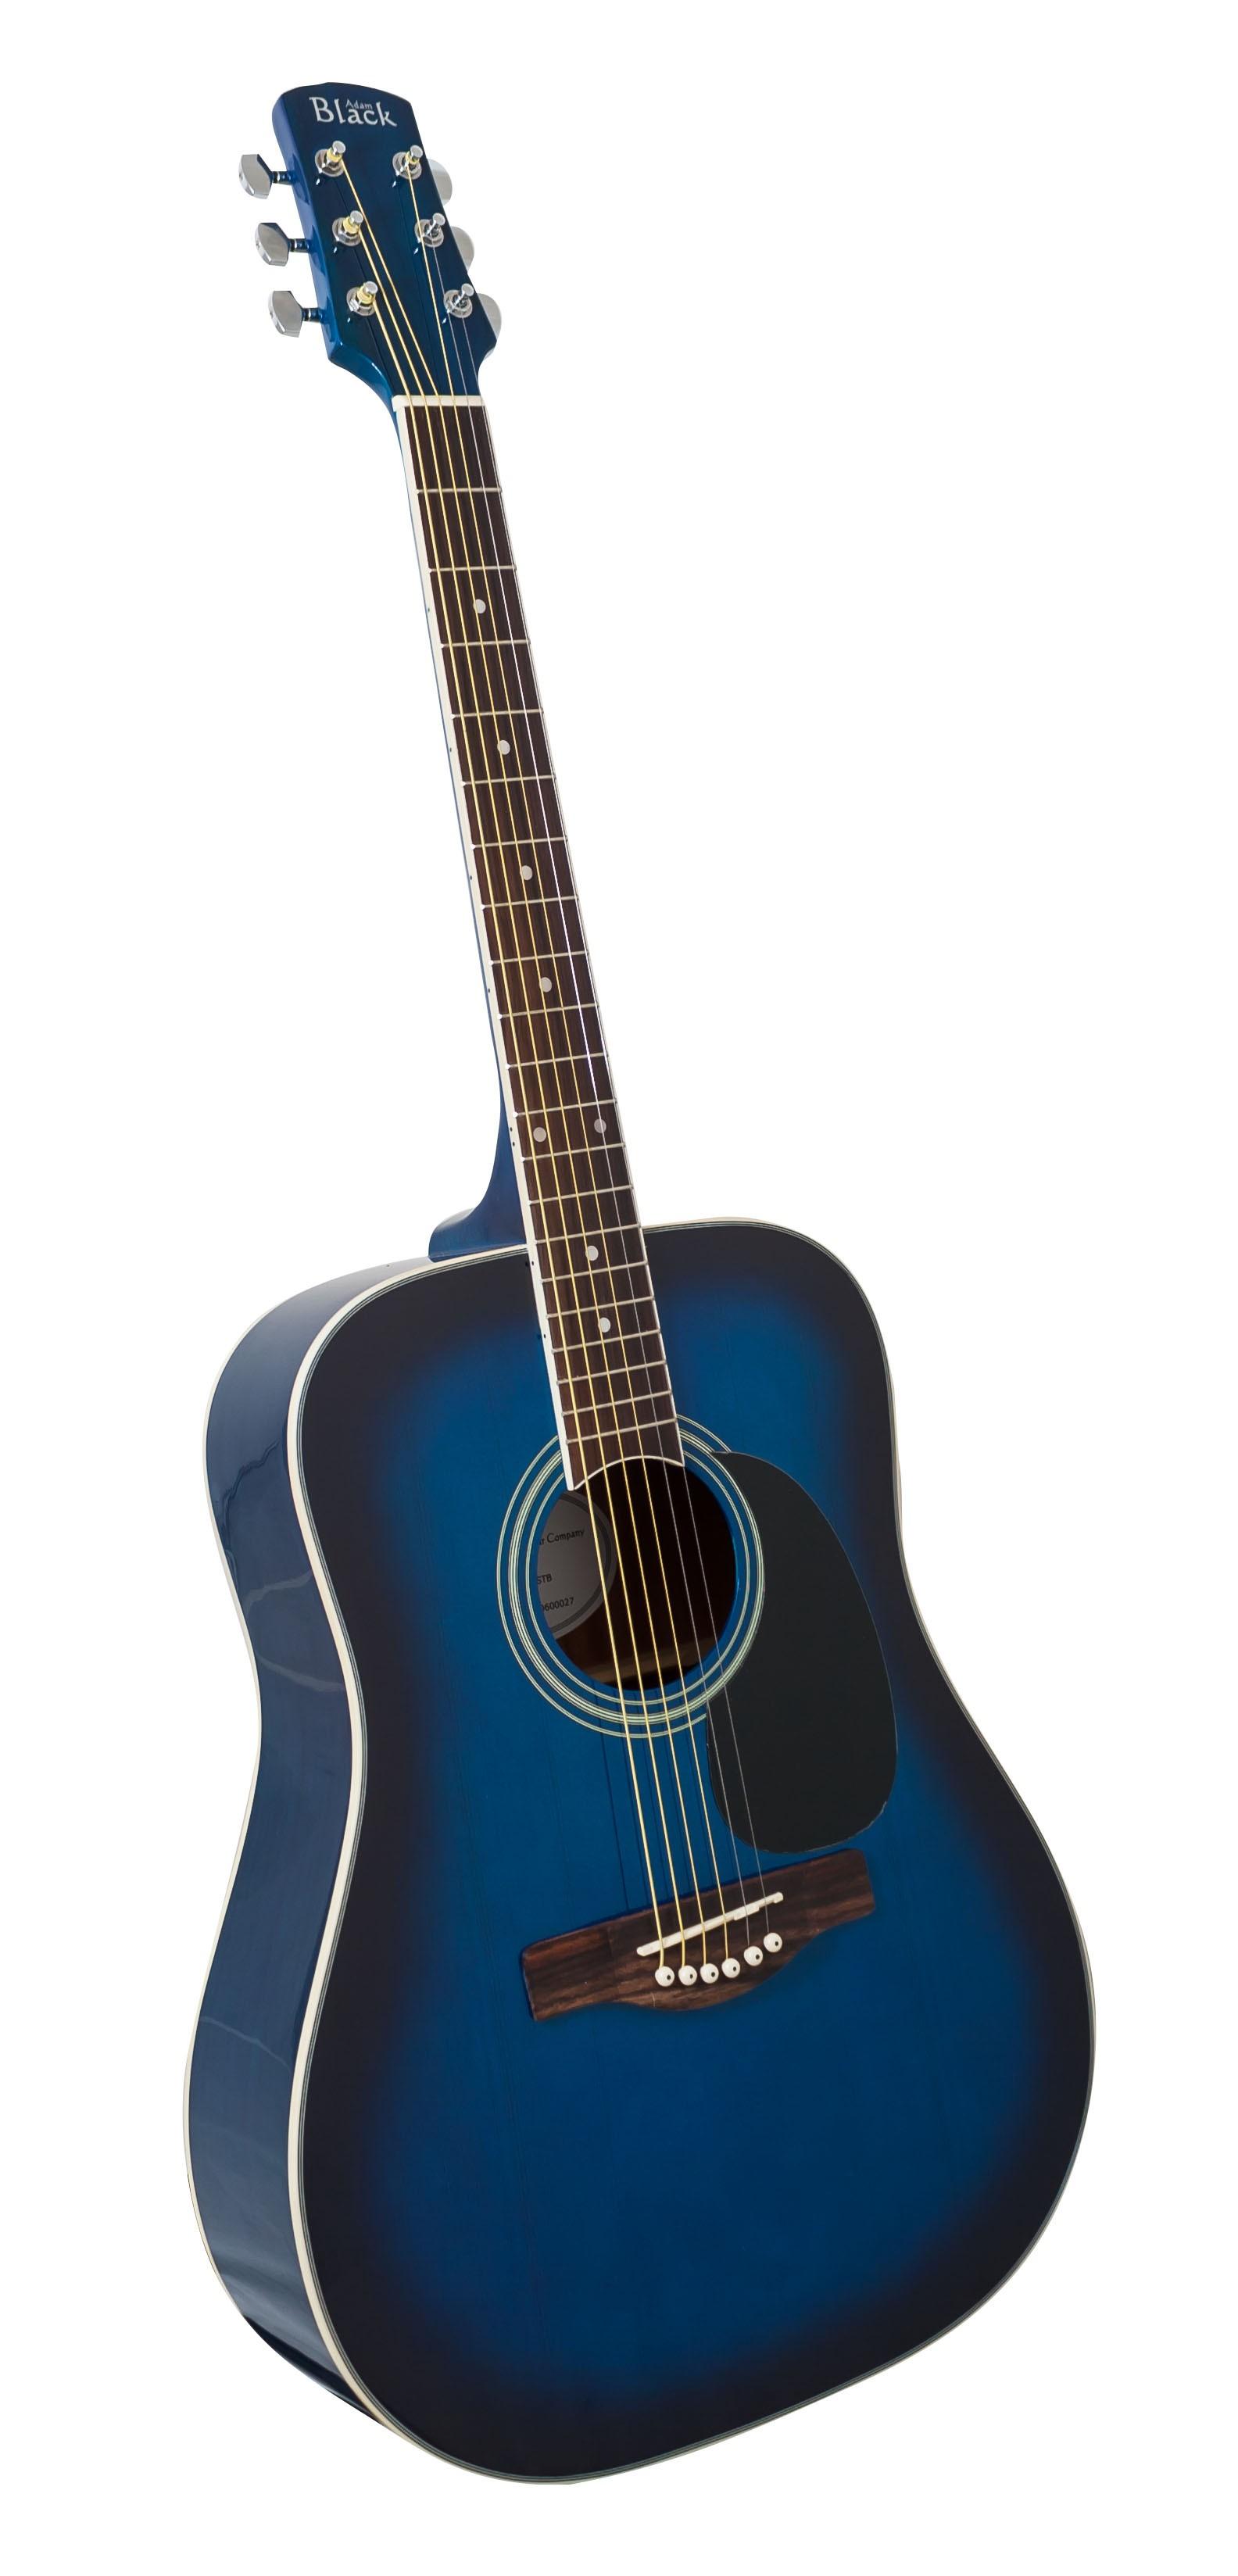 Adam Black S-2 - Trans Blue